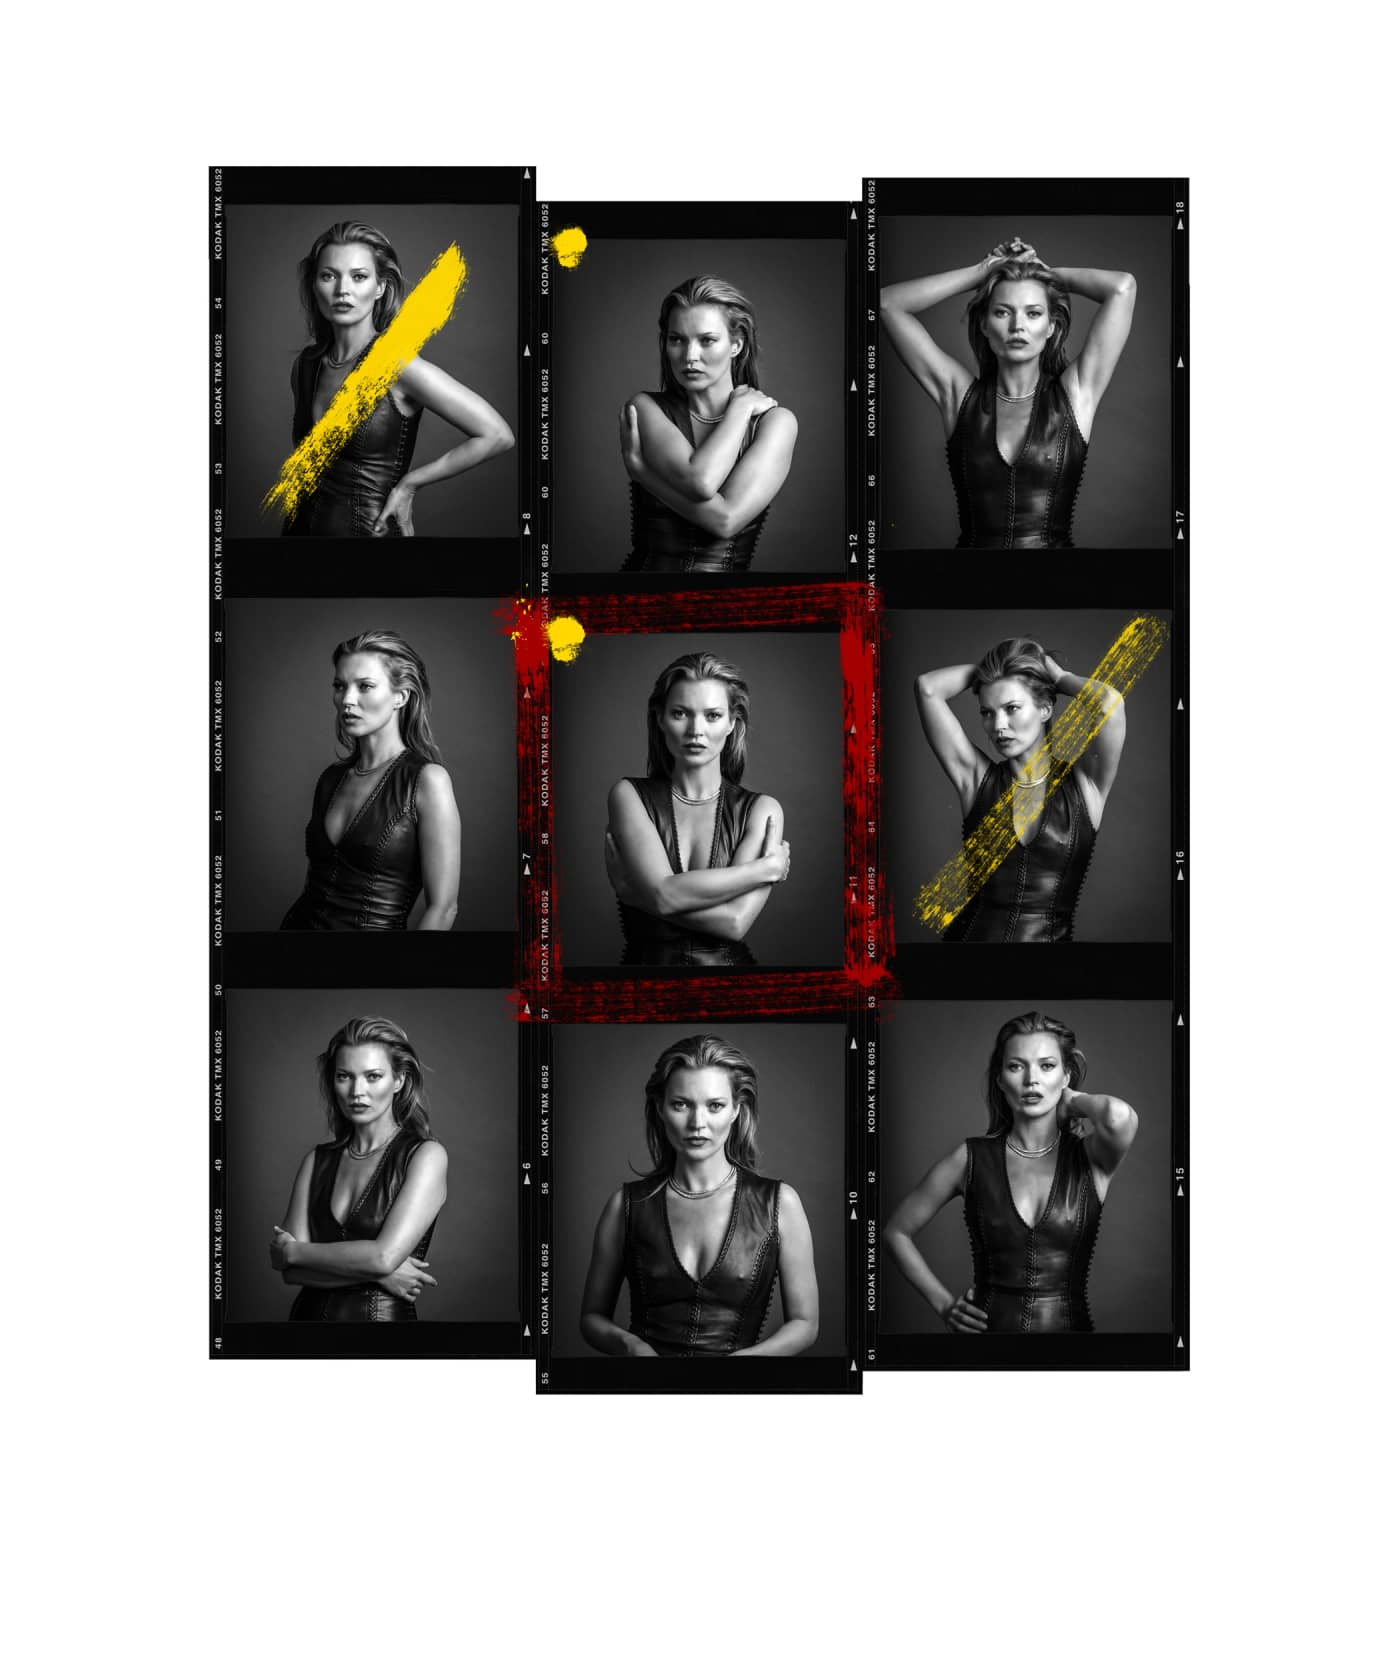 Andy Gotts Kate Moss Contact Sheet Fine Art Giclée Archival Print